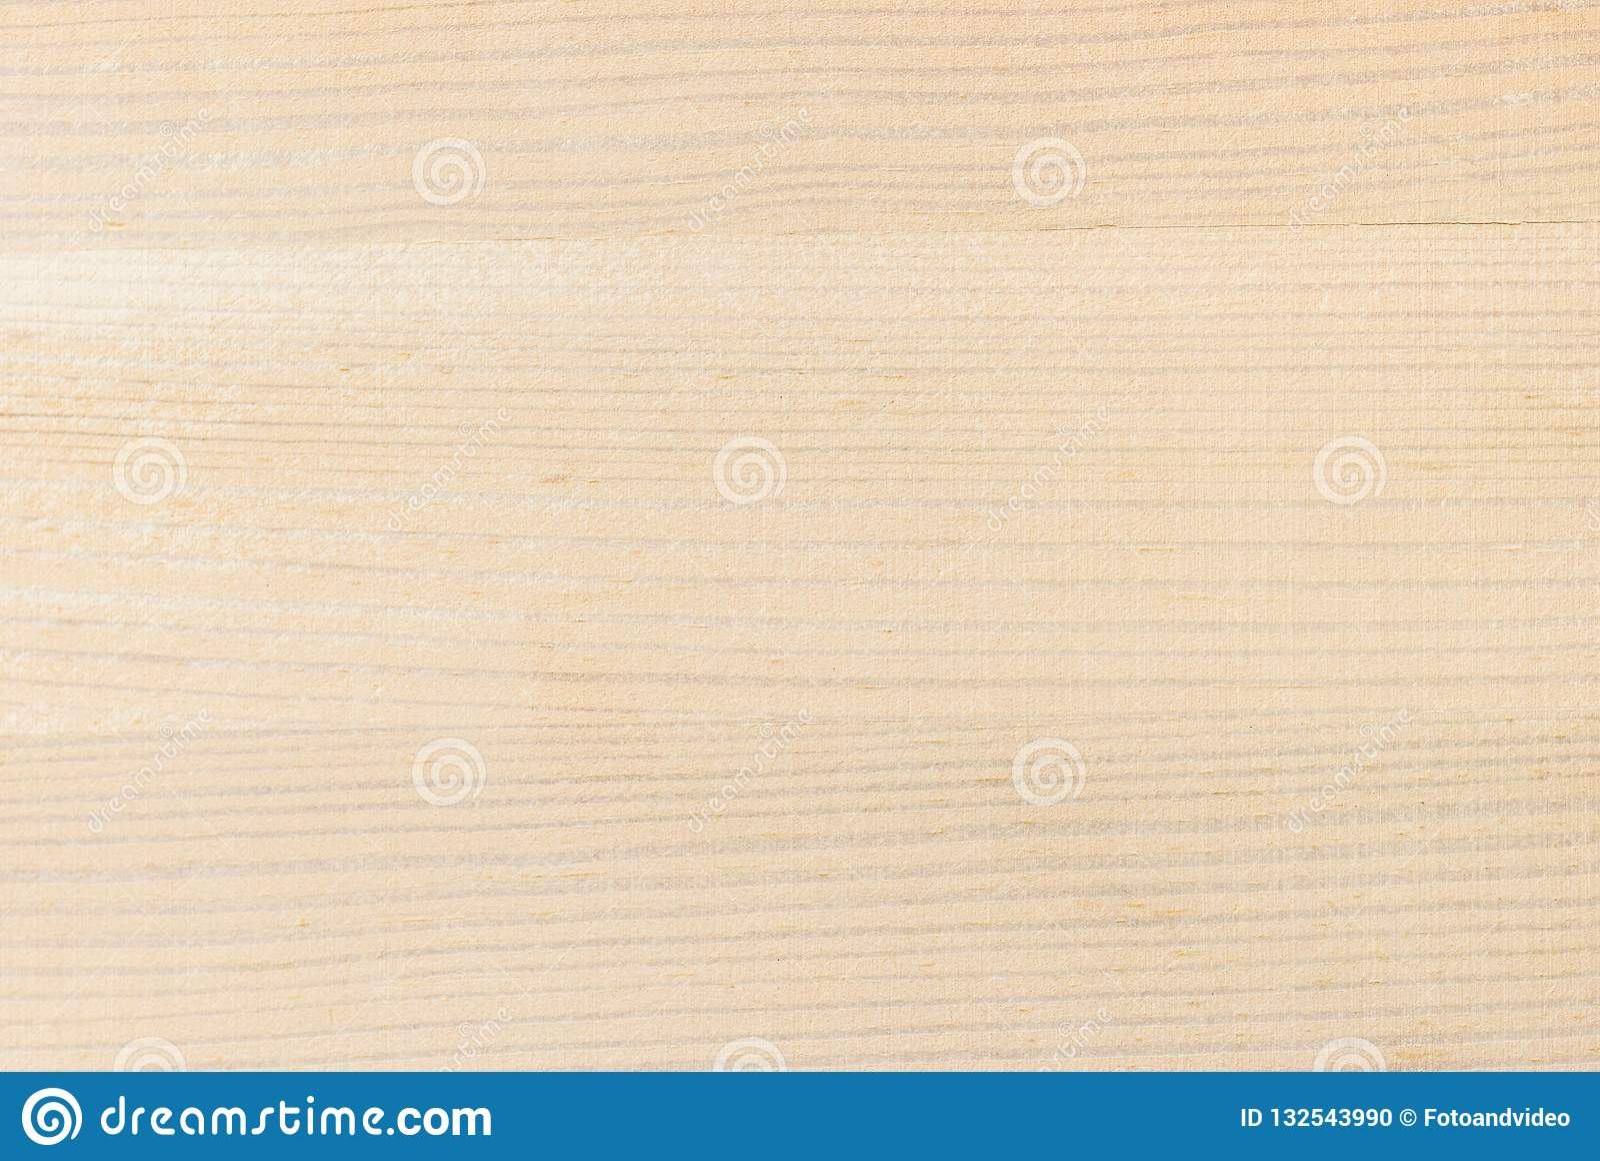 Wood surface texture, light brown beige